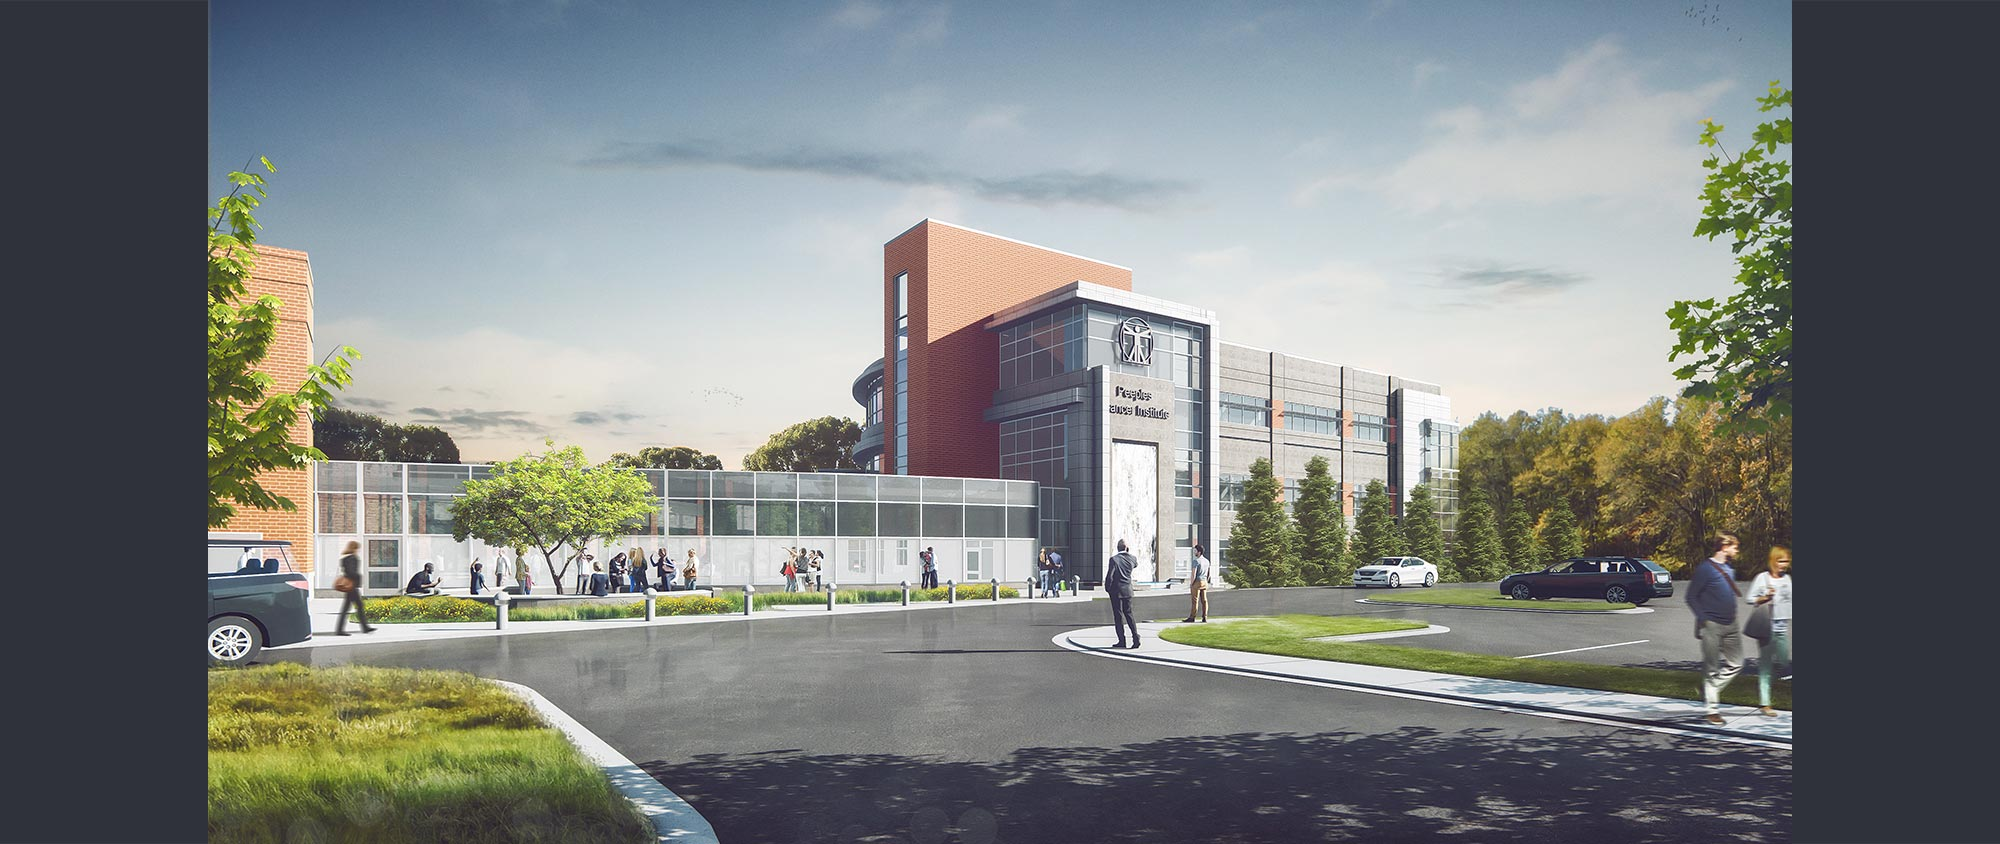 Peeples Cancer Institute at Hamilton Medical Center